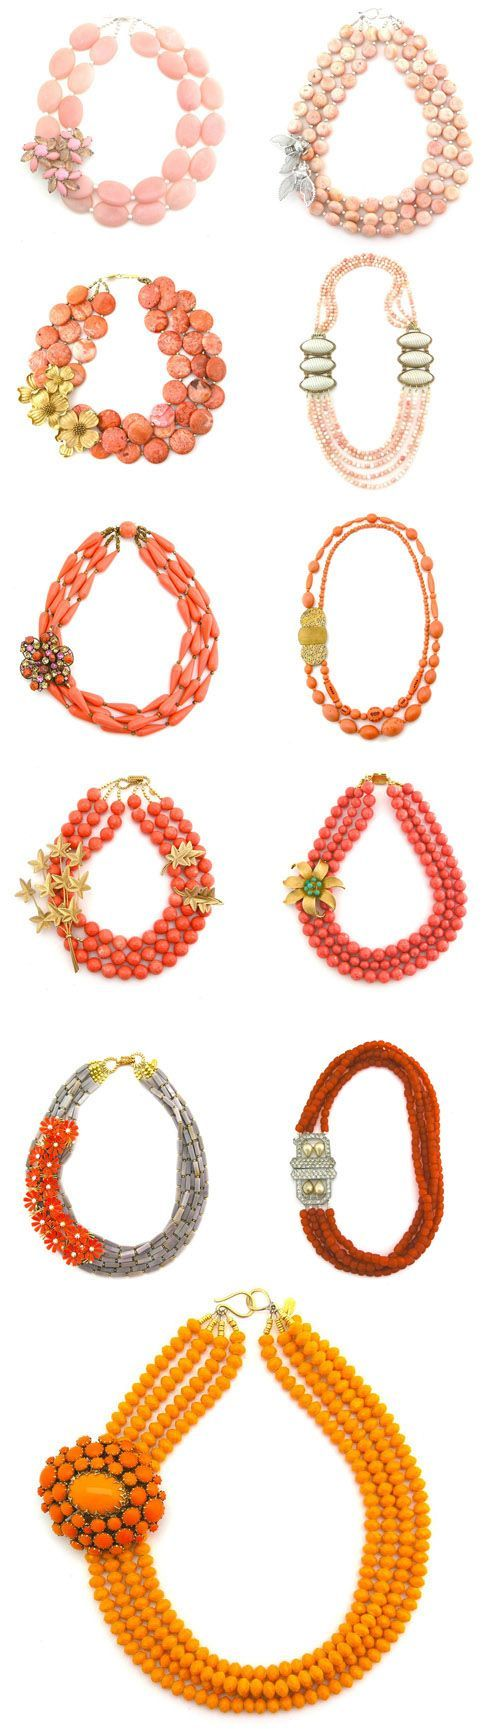 Elva Fields Spring 2012 Vintage Necklace Collectio…